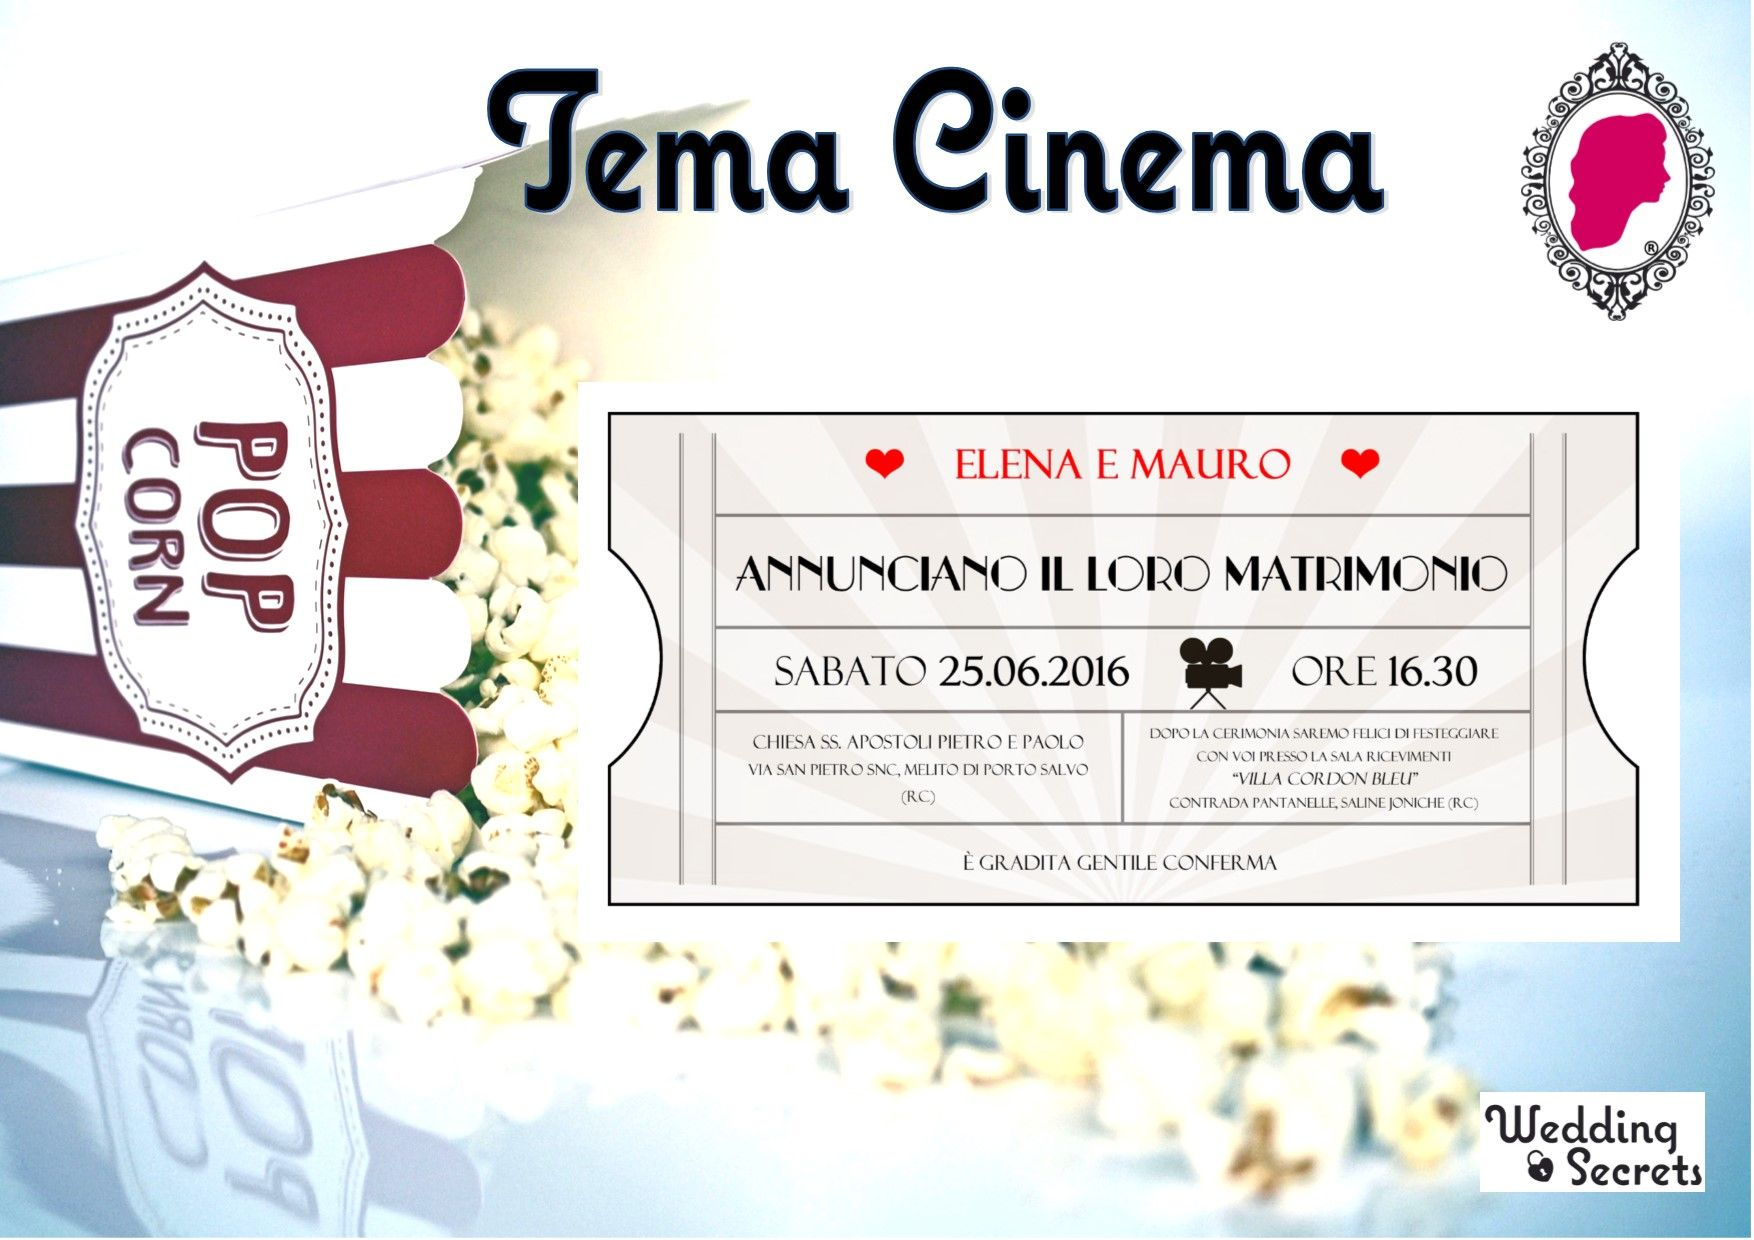 Partecipazioni Matrimonio Tema Cinema.Partecipazioni A Tema Cinema Per Il Tuo Matrimonio Perfetto